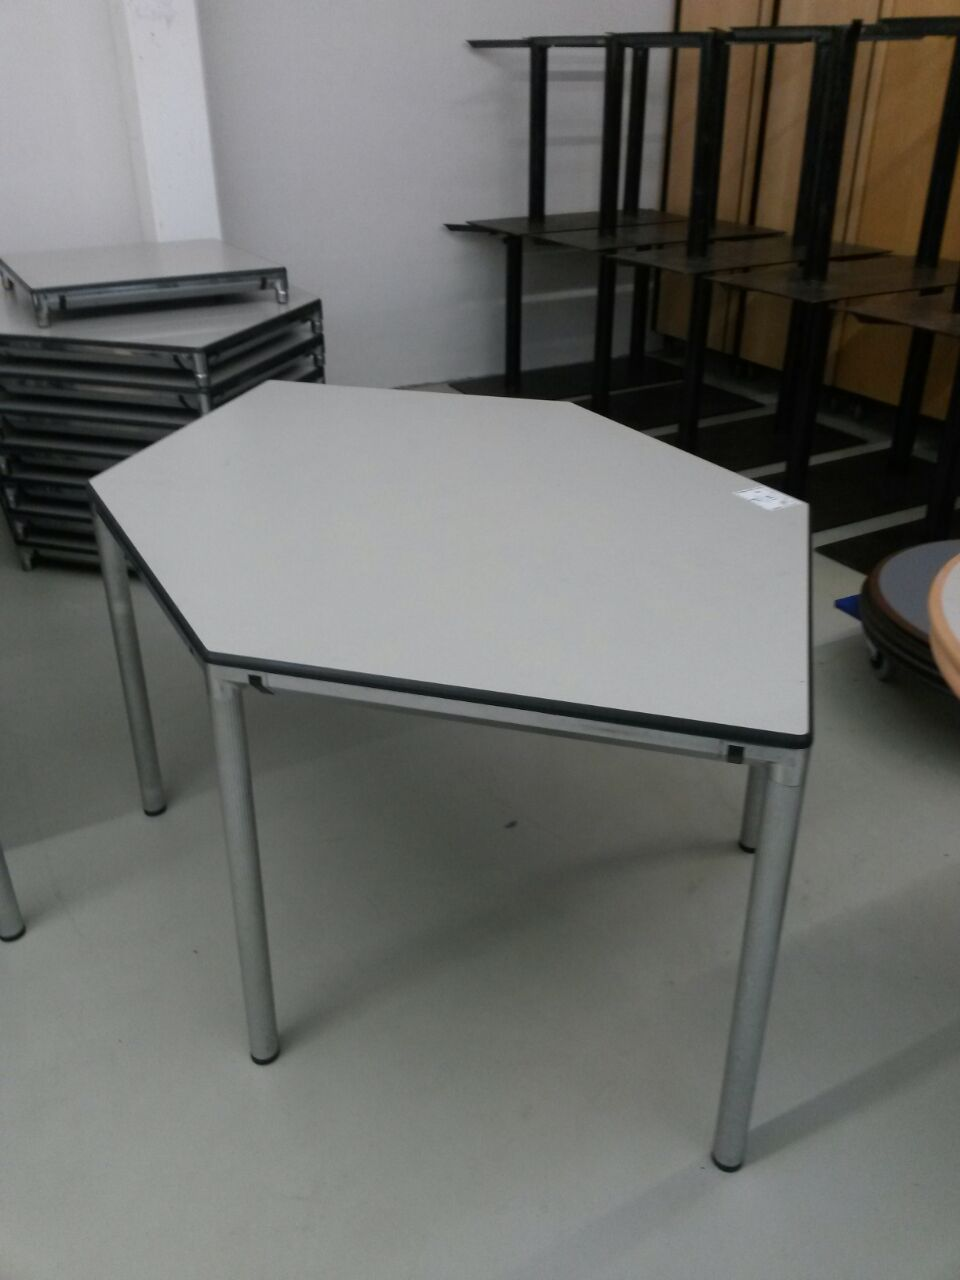 sechseckiger tisch von vitra in grau. Black Bedroom Furniture Sets. Home Design Ideas